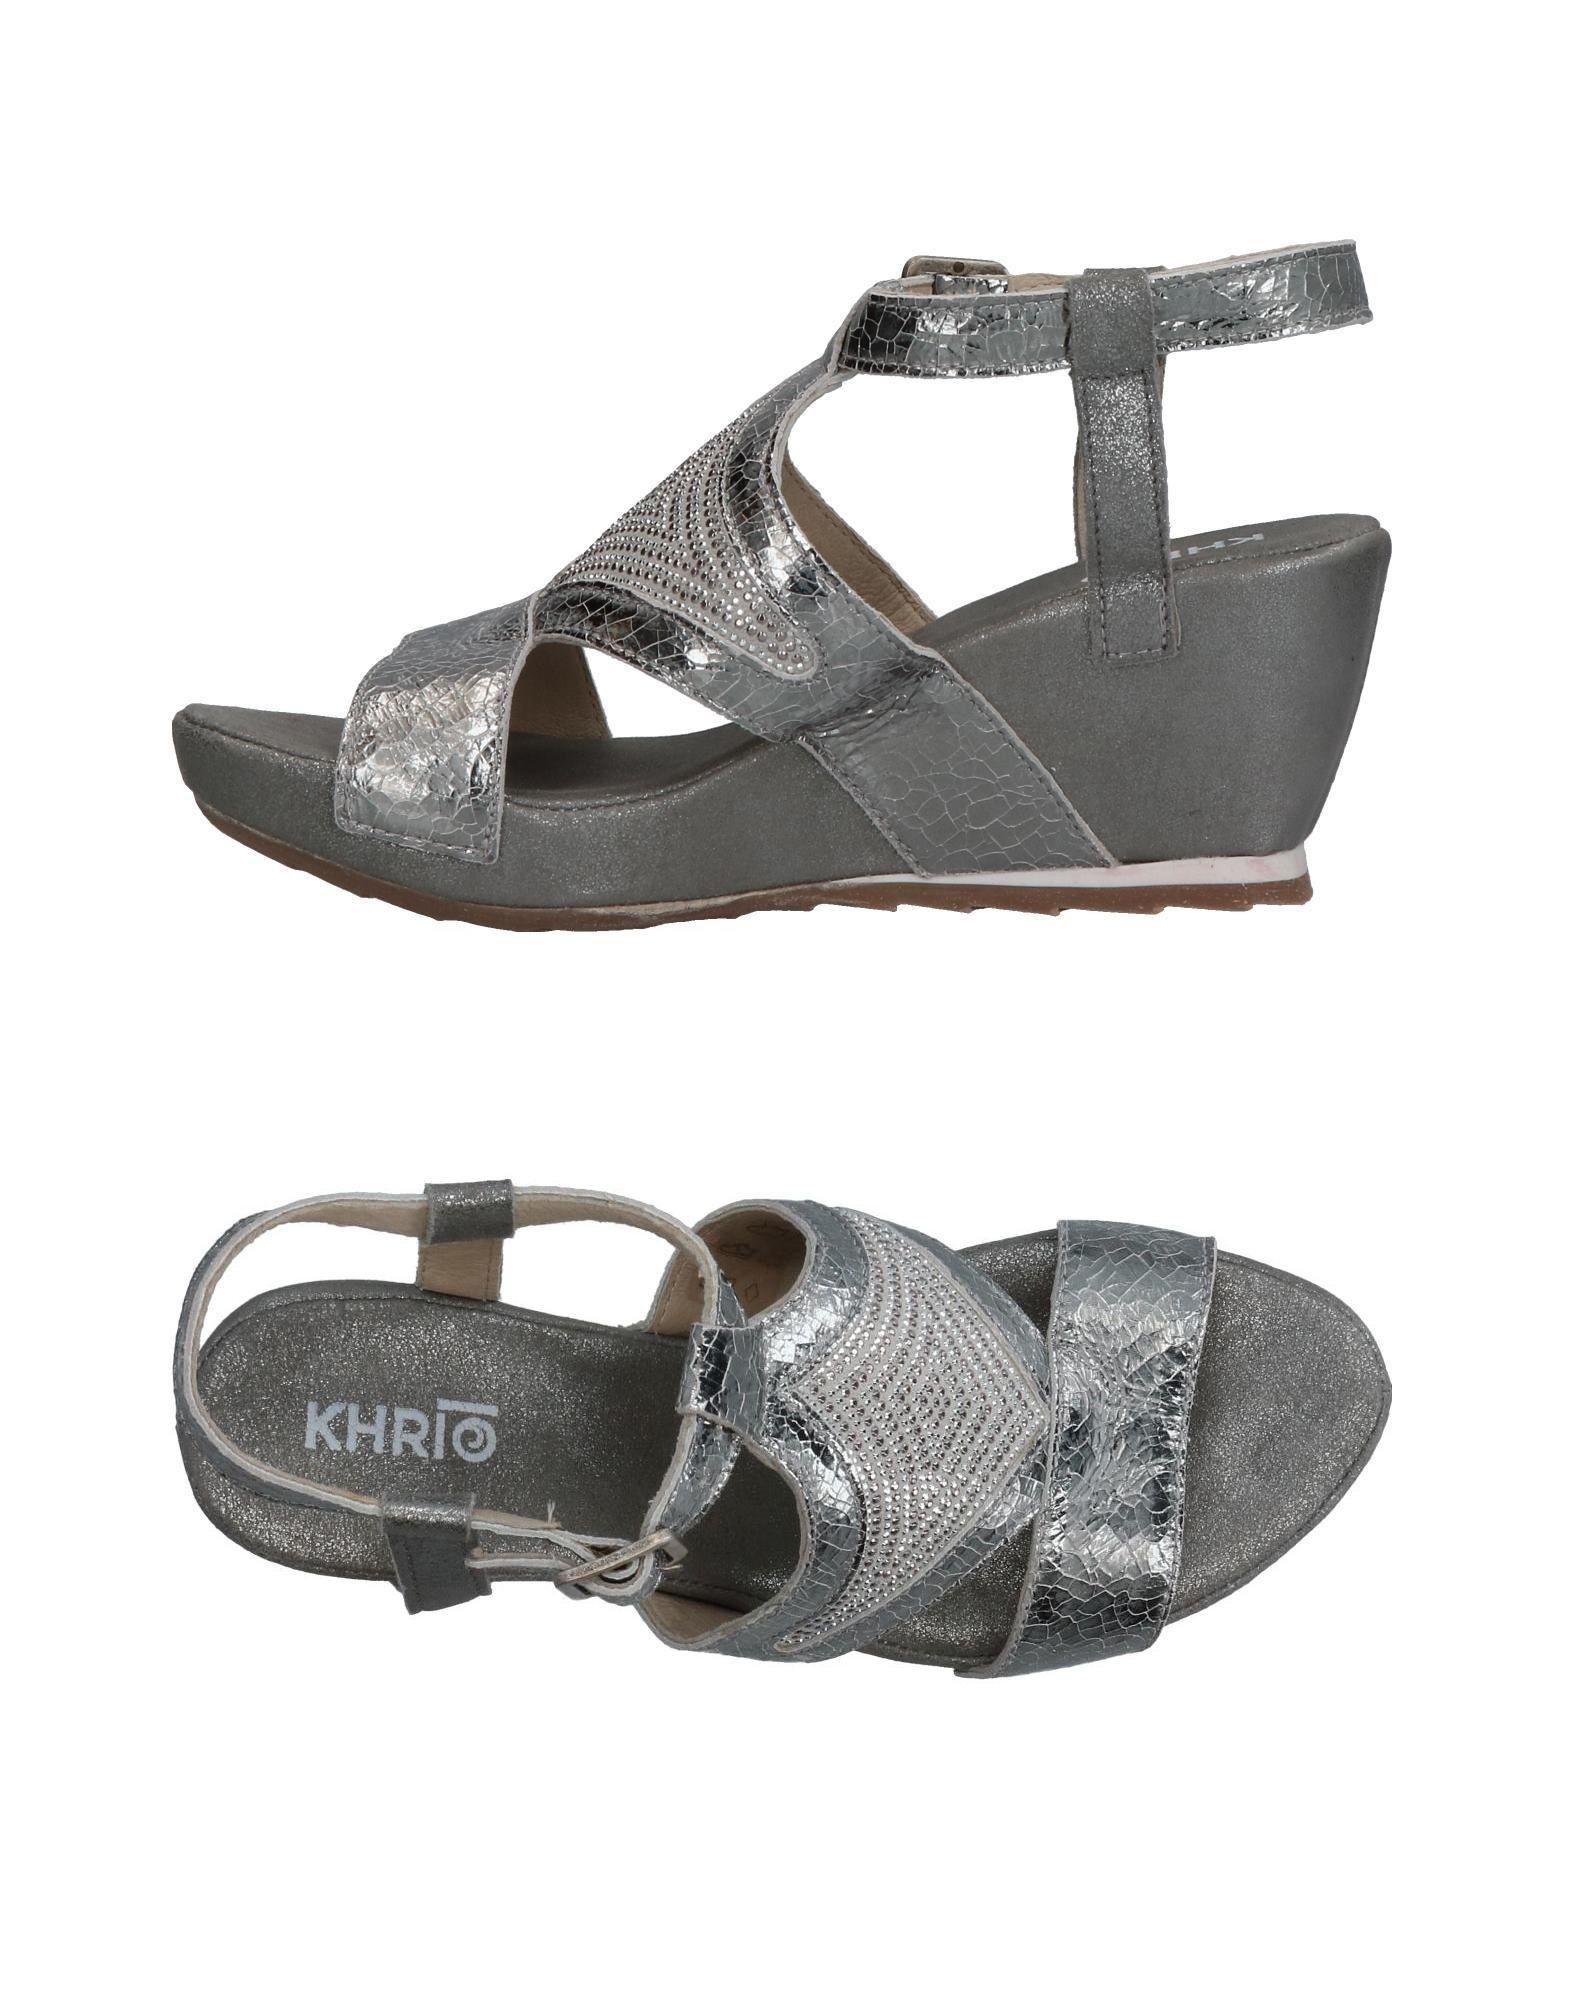 Khrio' Sandals Sandals Khrio' - Women Khrio' Sandals online on  Canada - 11327075VR 5174b3